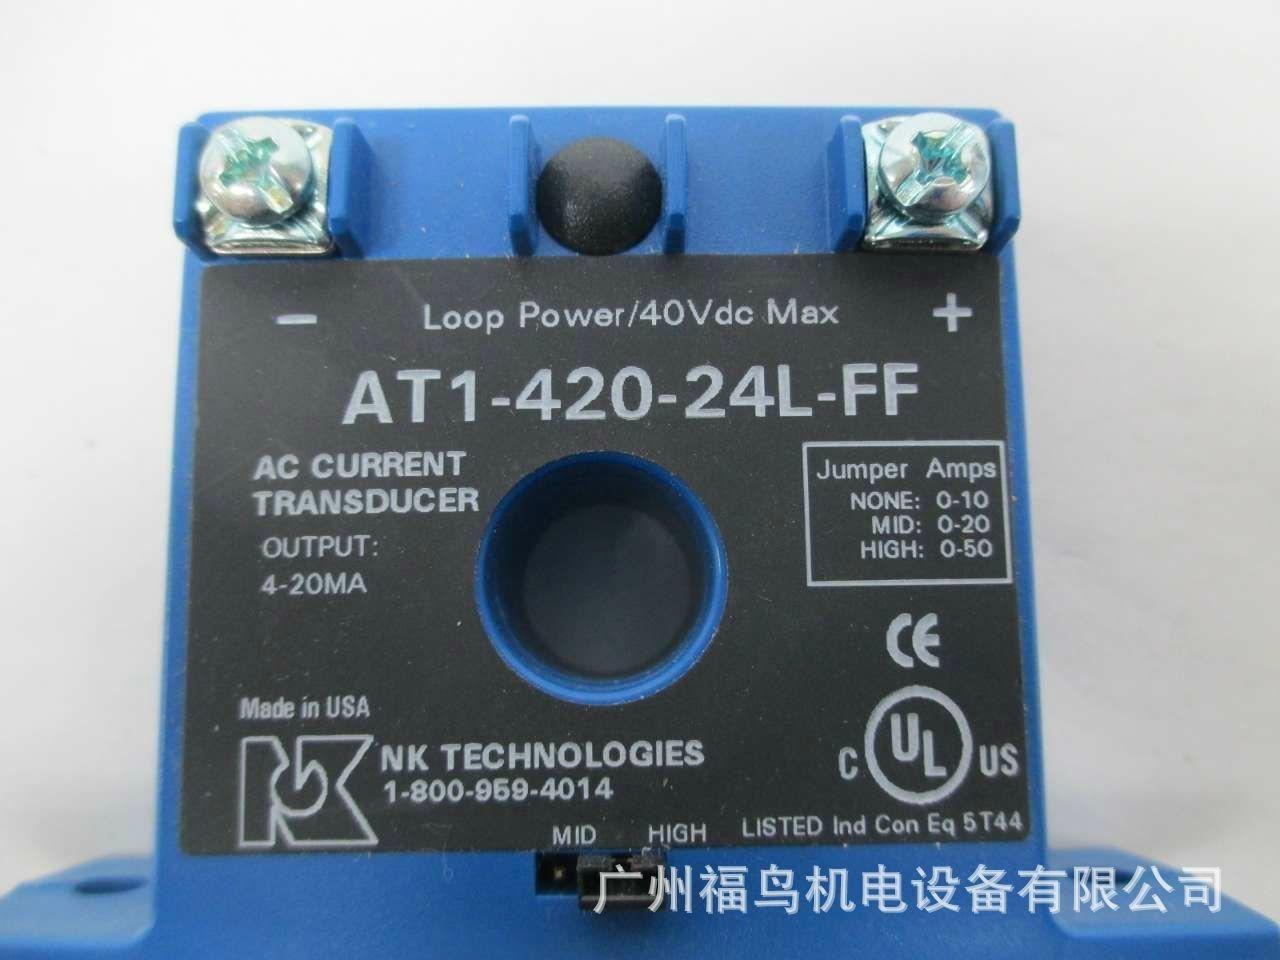 NK TECHNOLOGIES電流傳感器, 型號: AT1-420-24L-FF